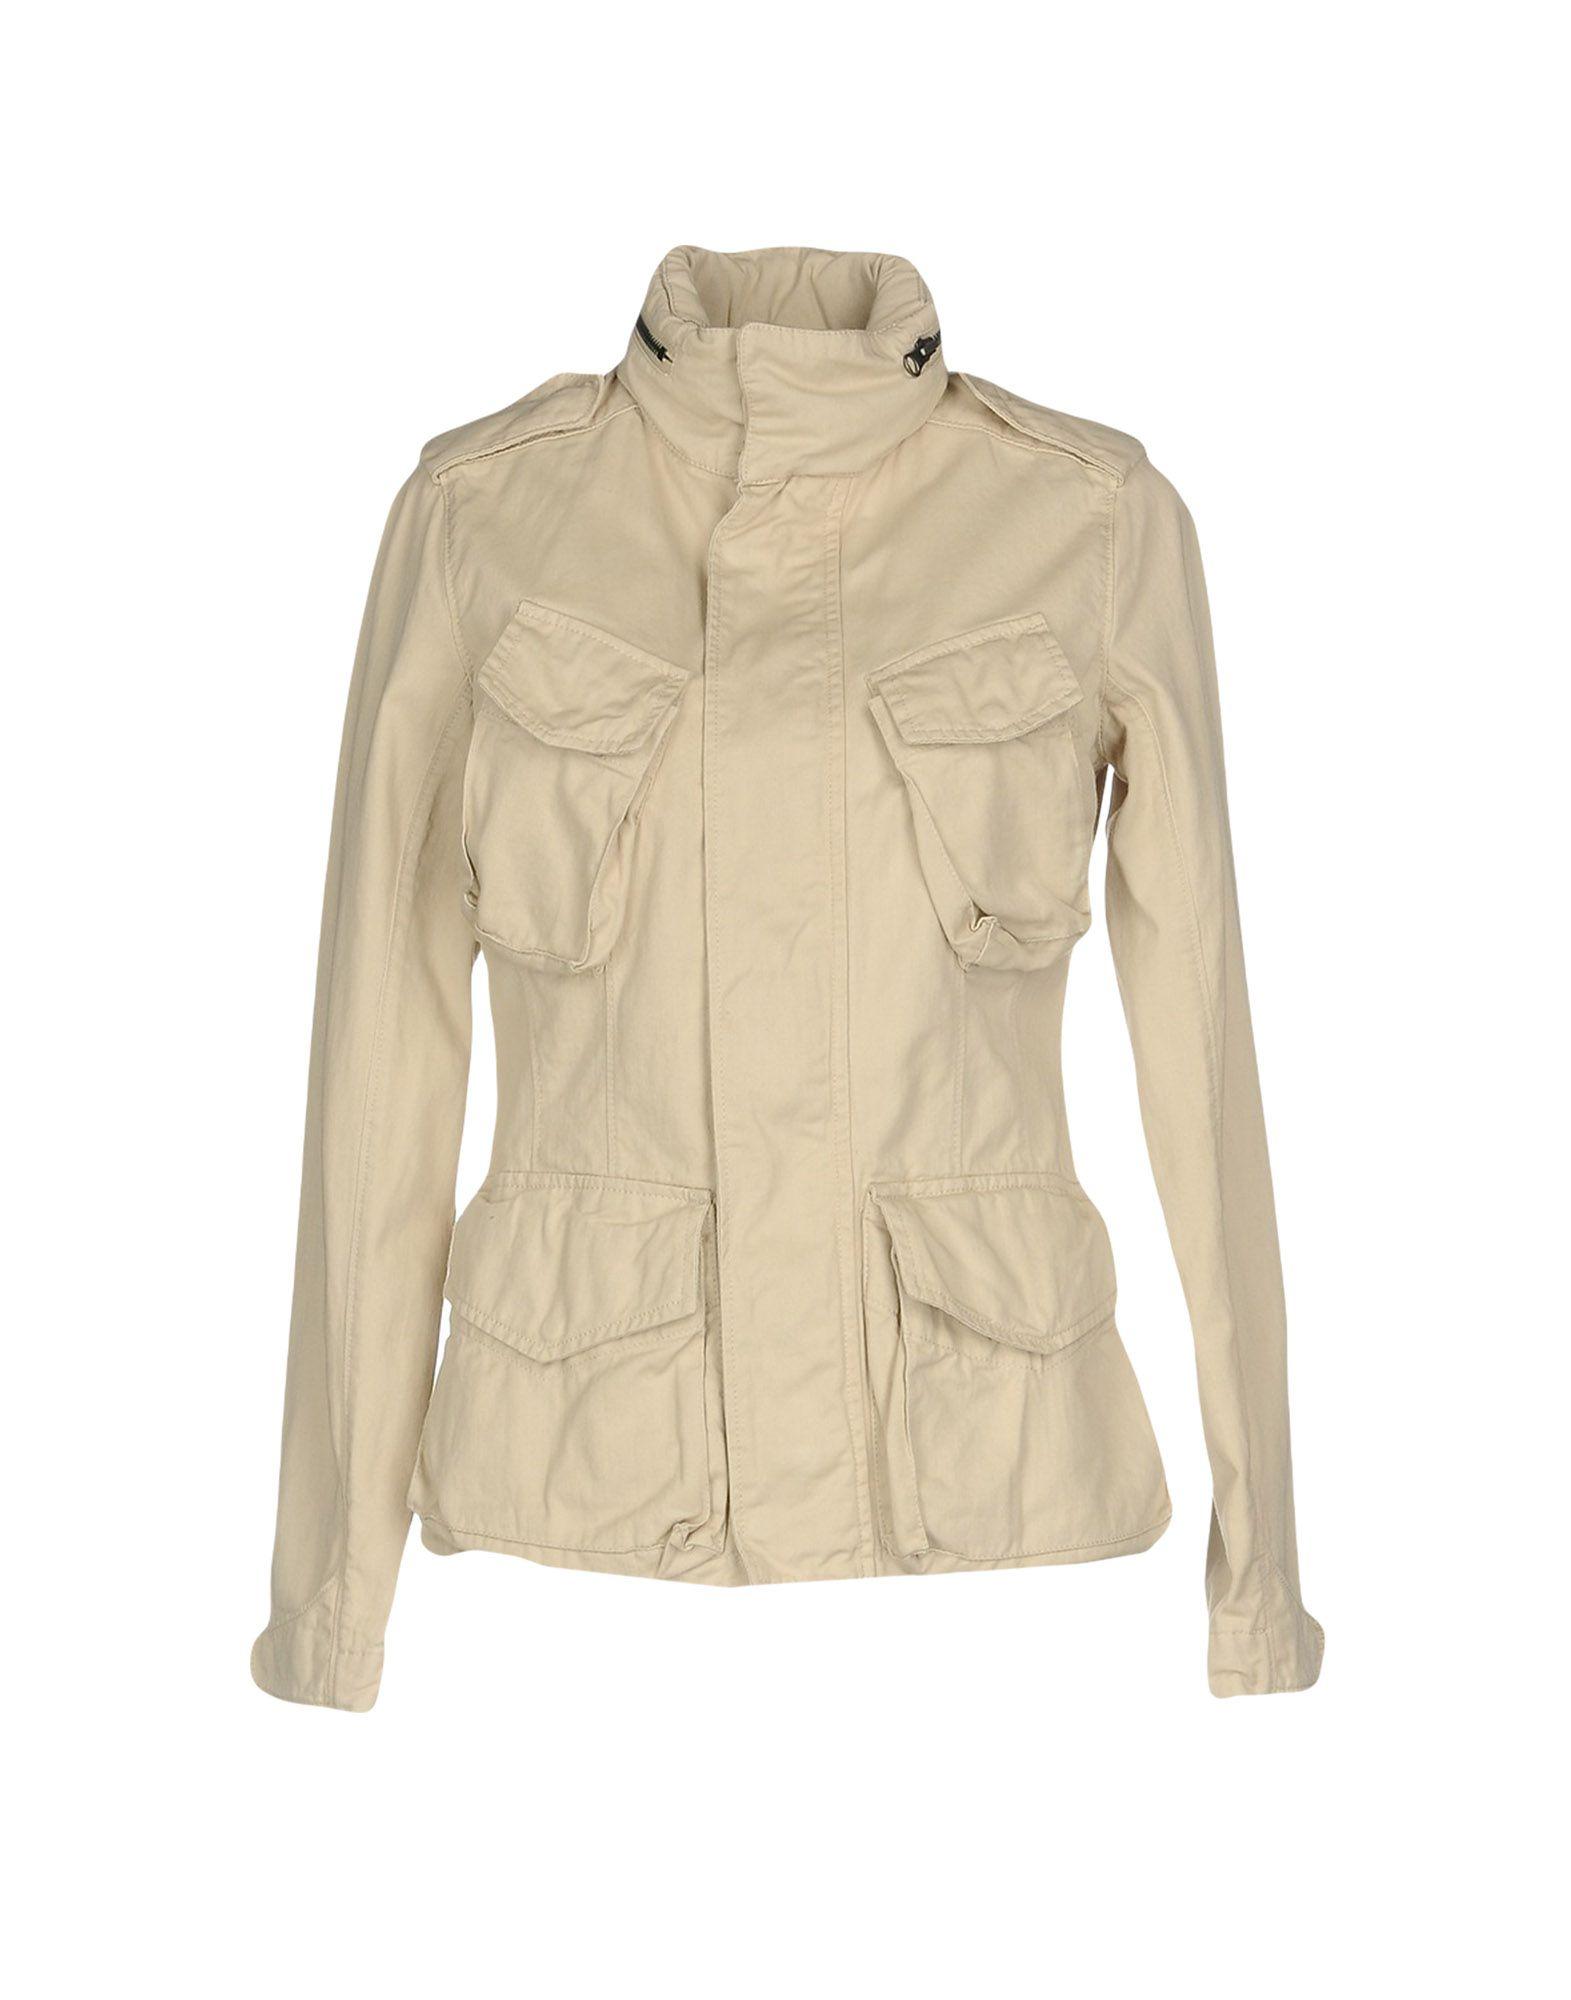 ASPESI Джинсовая верхняя одежда верхняя одежда